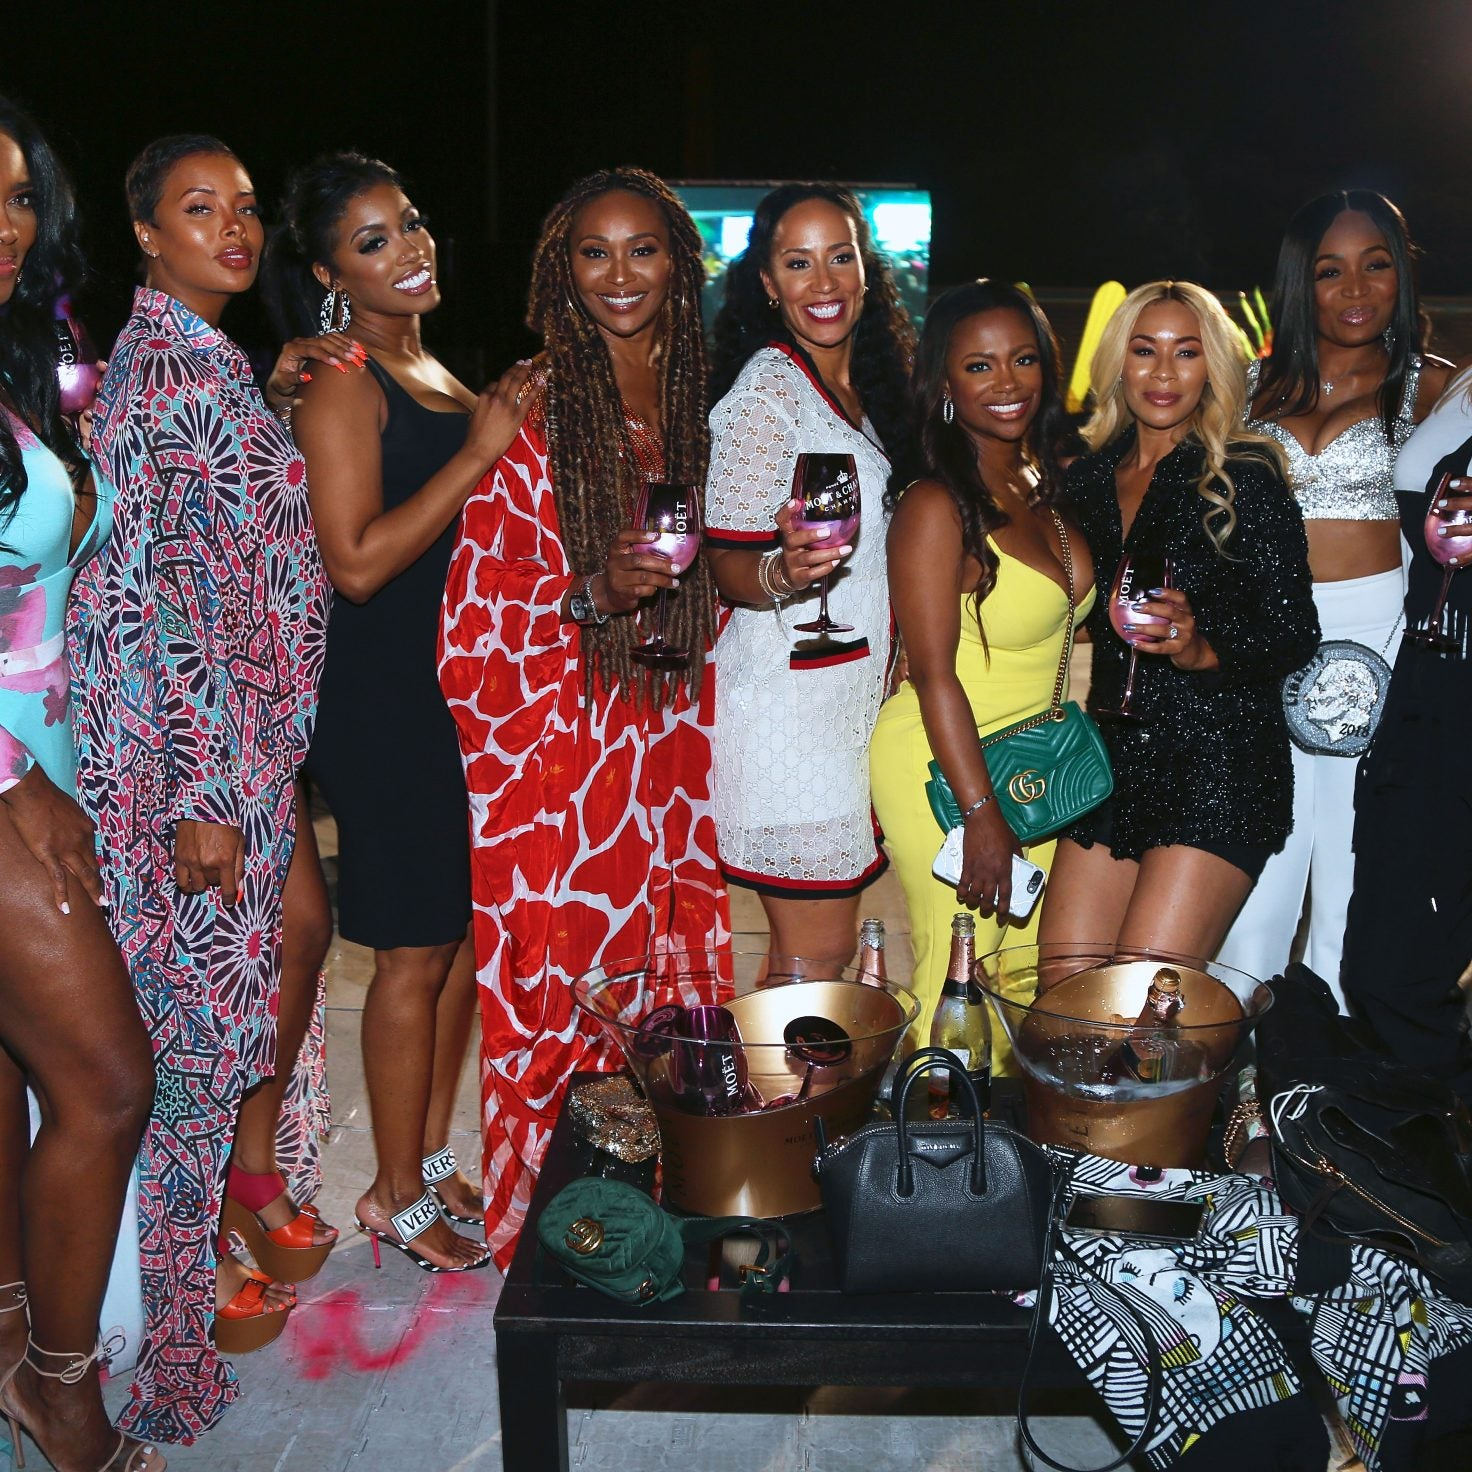 'The Real Housewives of Atlanta' Reunion Postponed Amid Coronavirus Outbreak